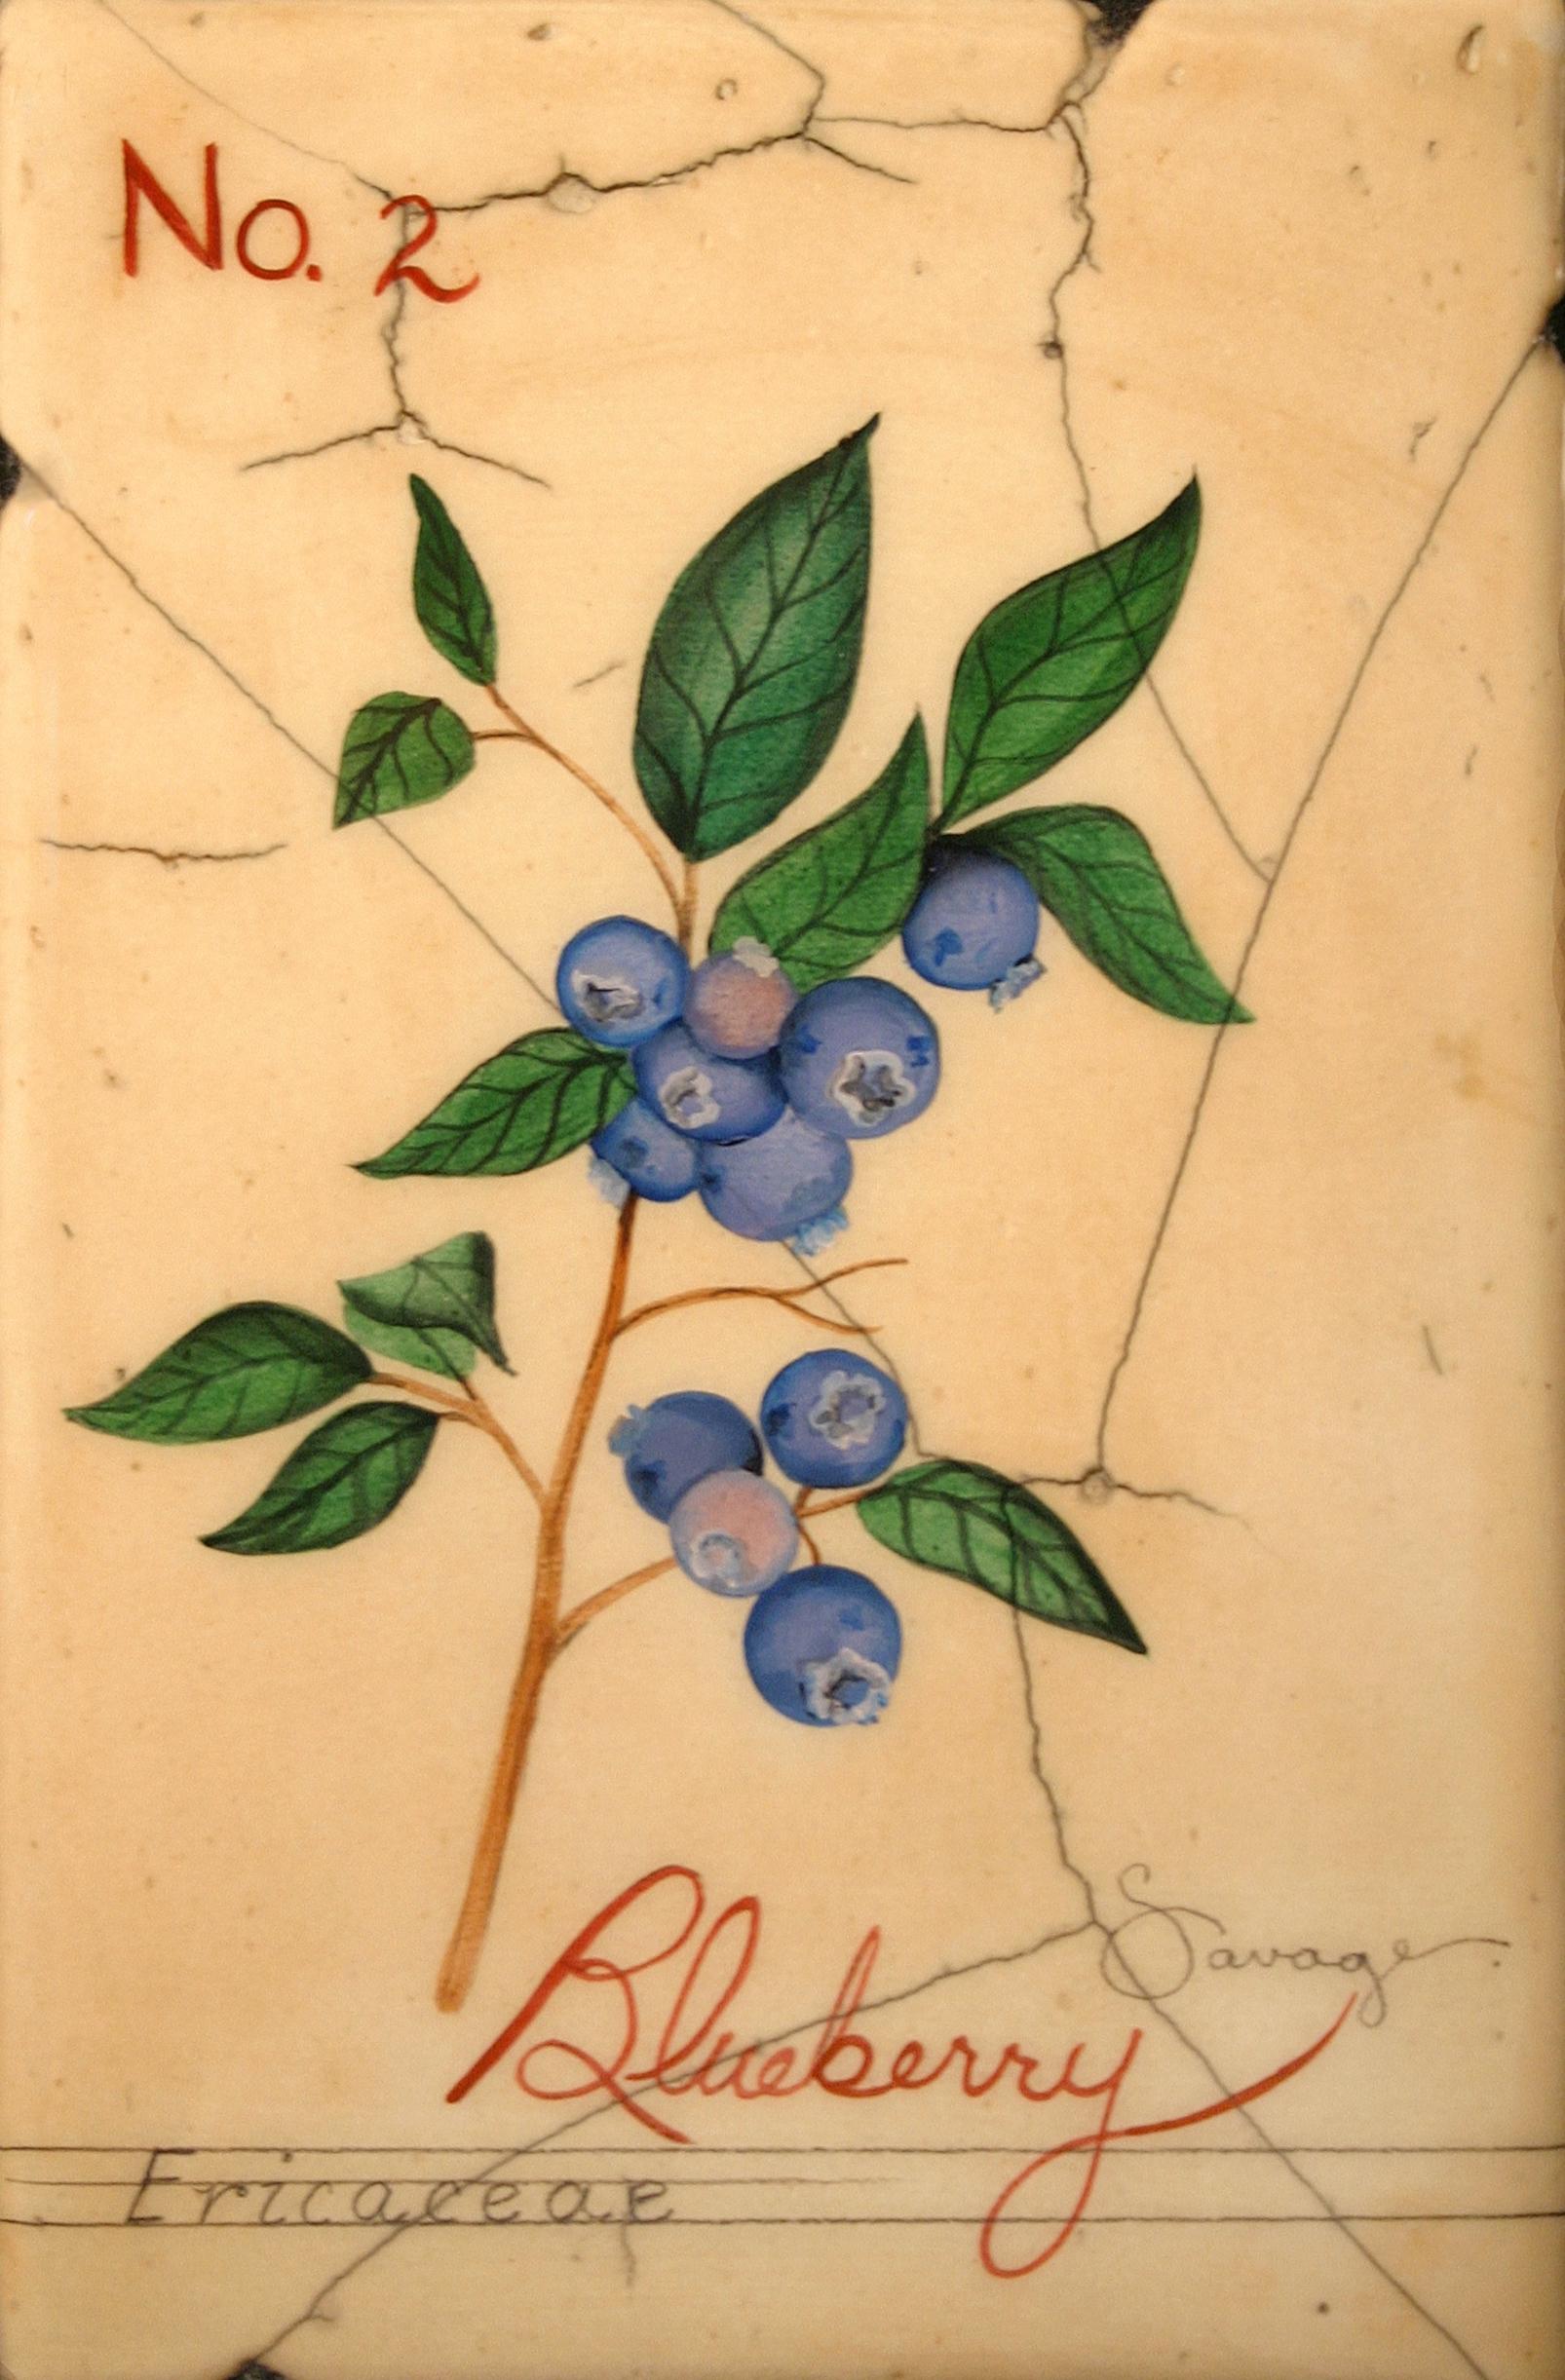 No. 2 Blueberry